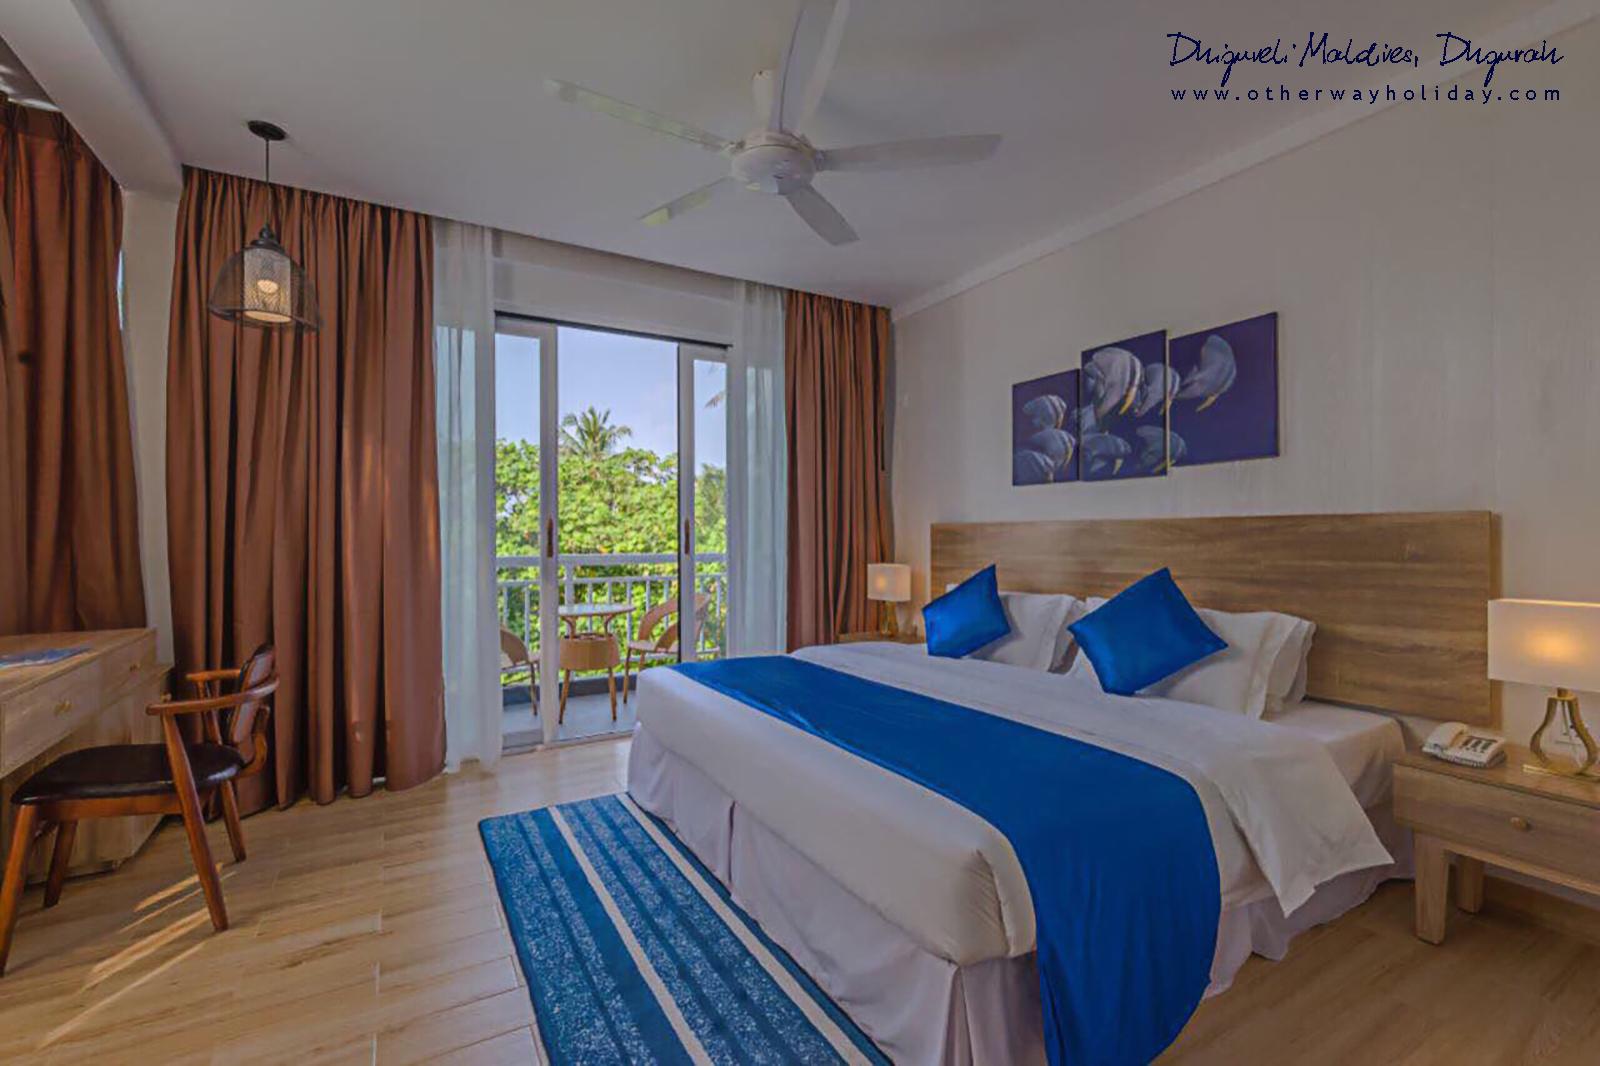 Dhiguveli Maldives, Dhigurah 12